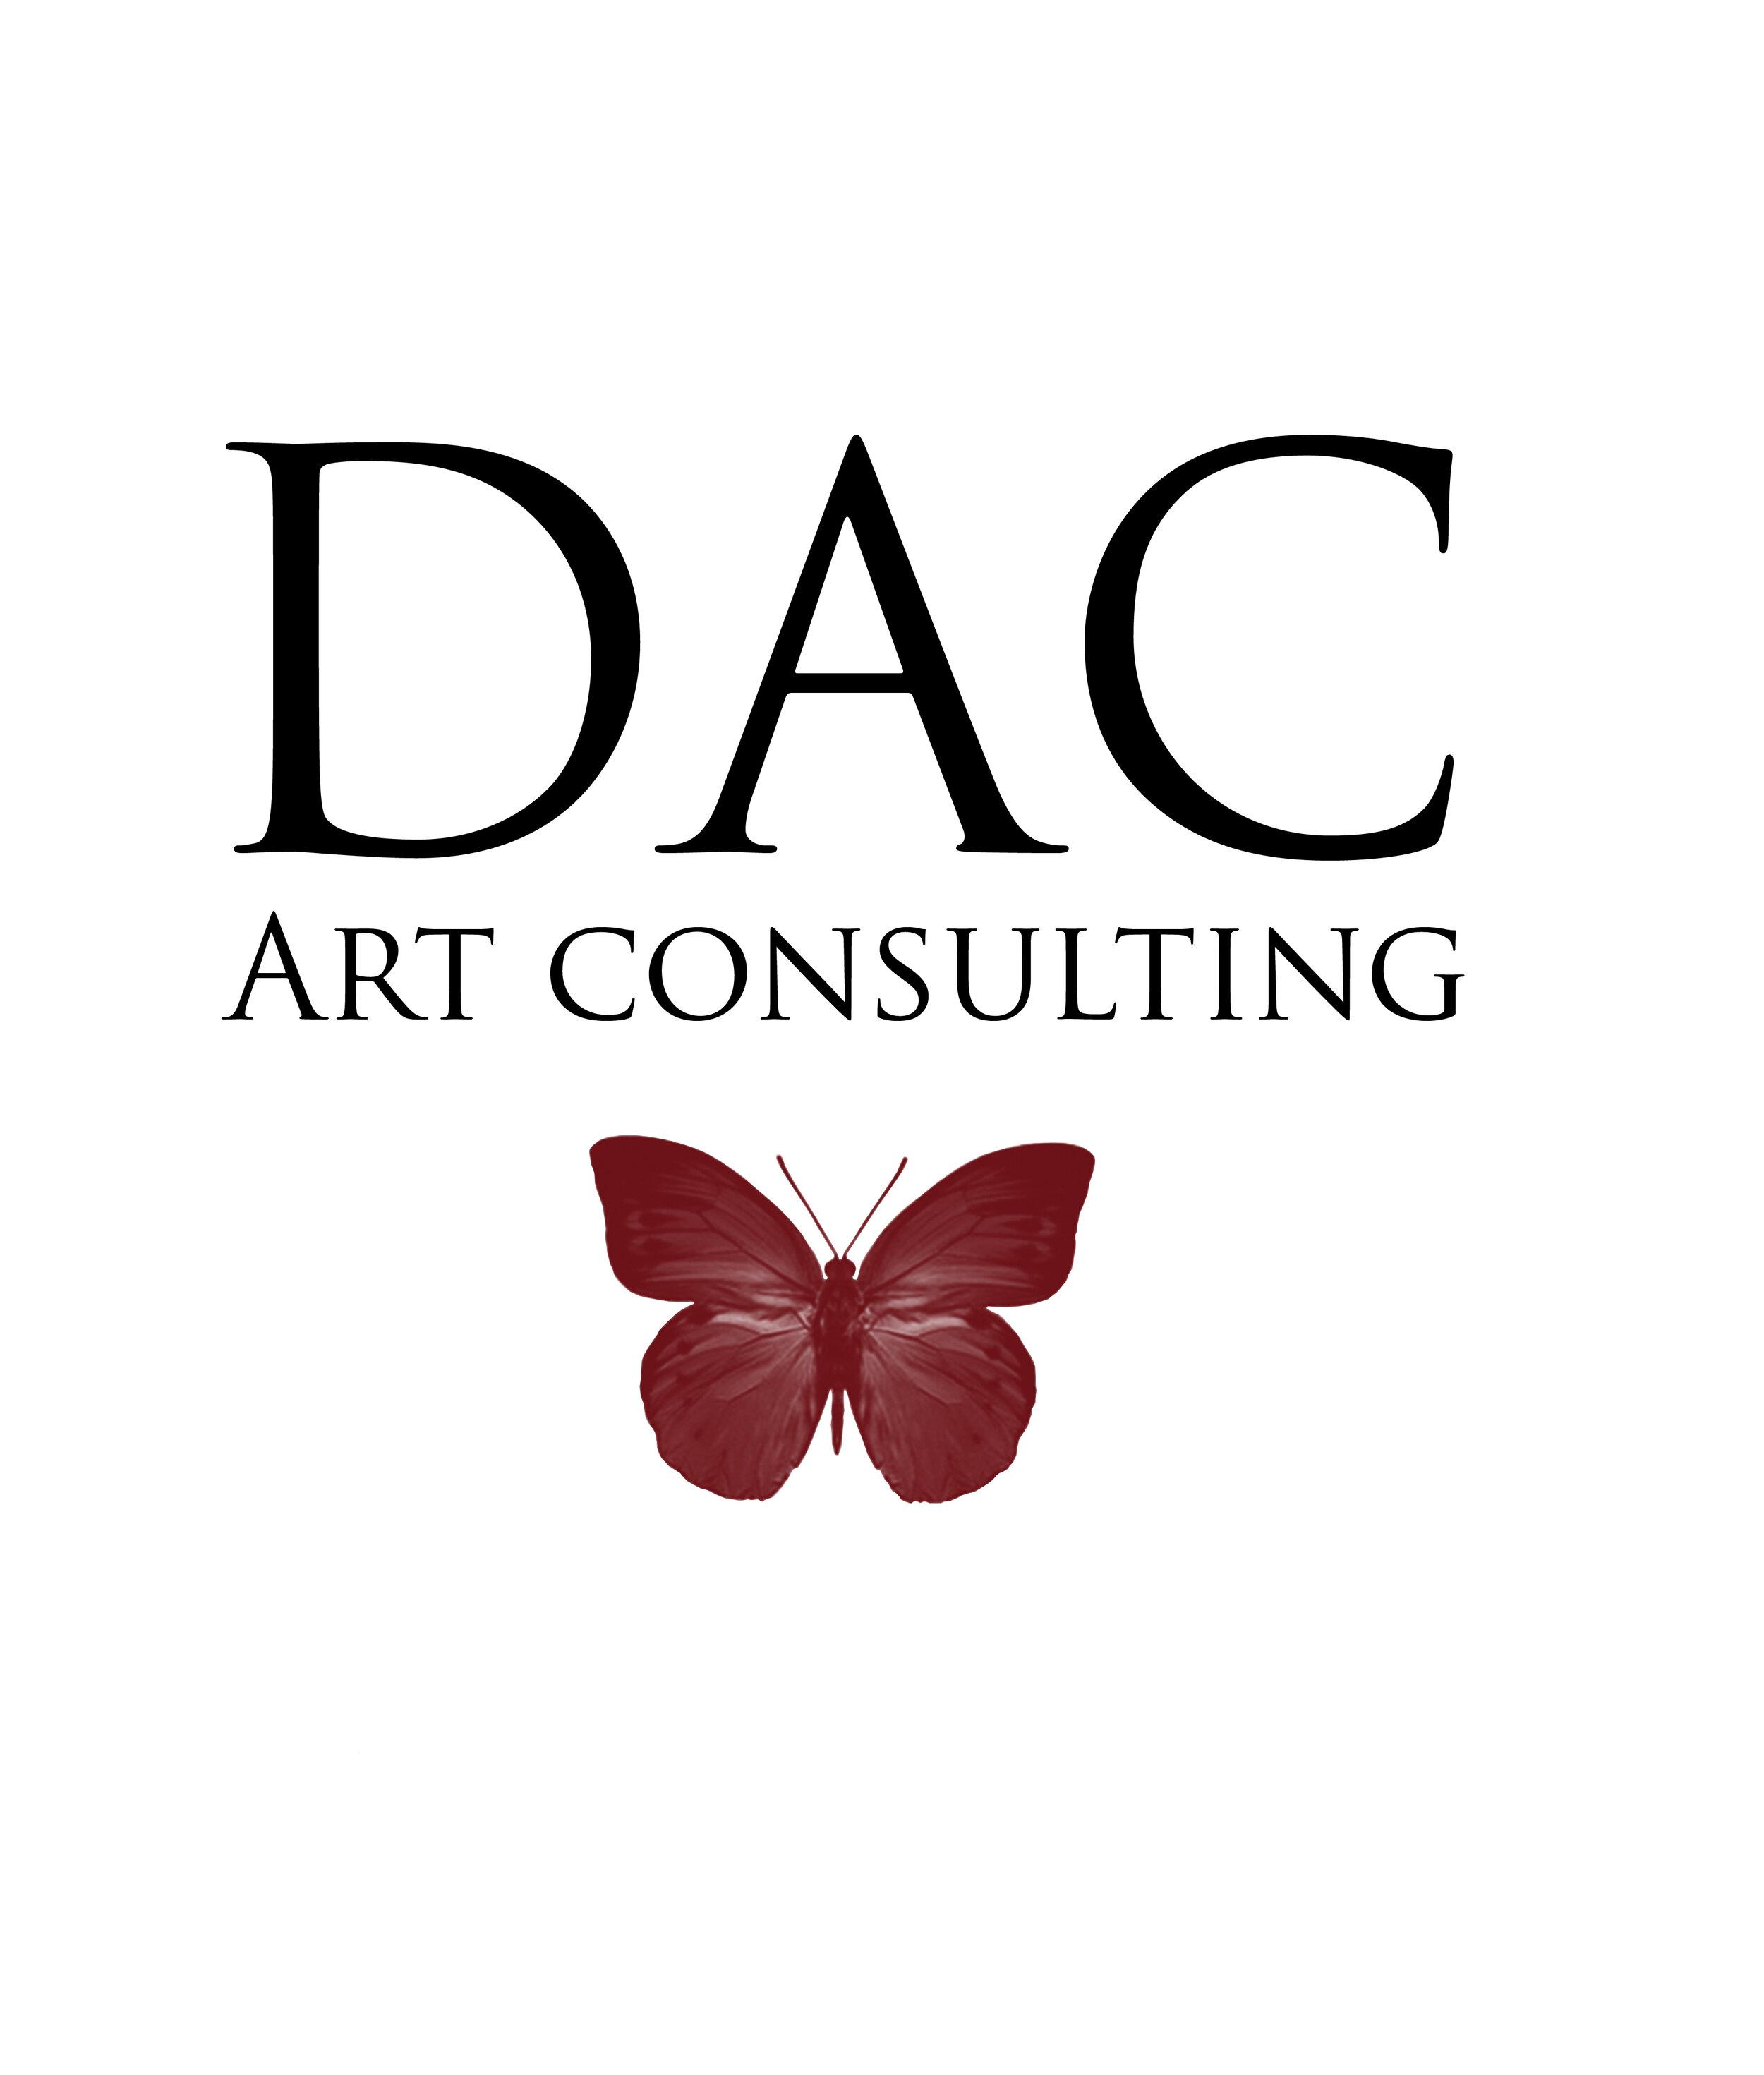 DAC LOGO- WHITE BACKGROUND w.Color.jpg